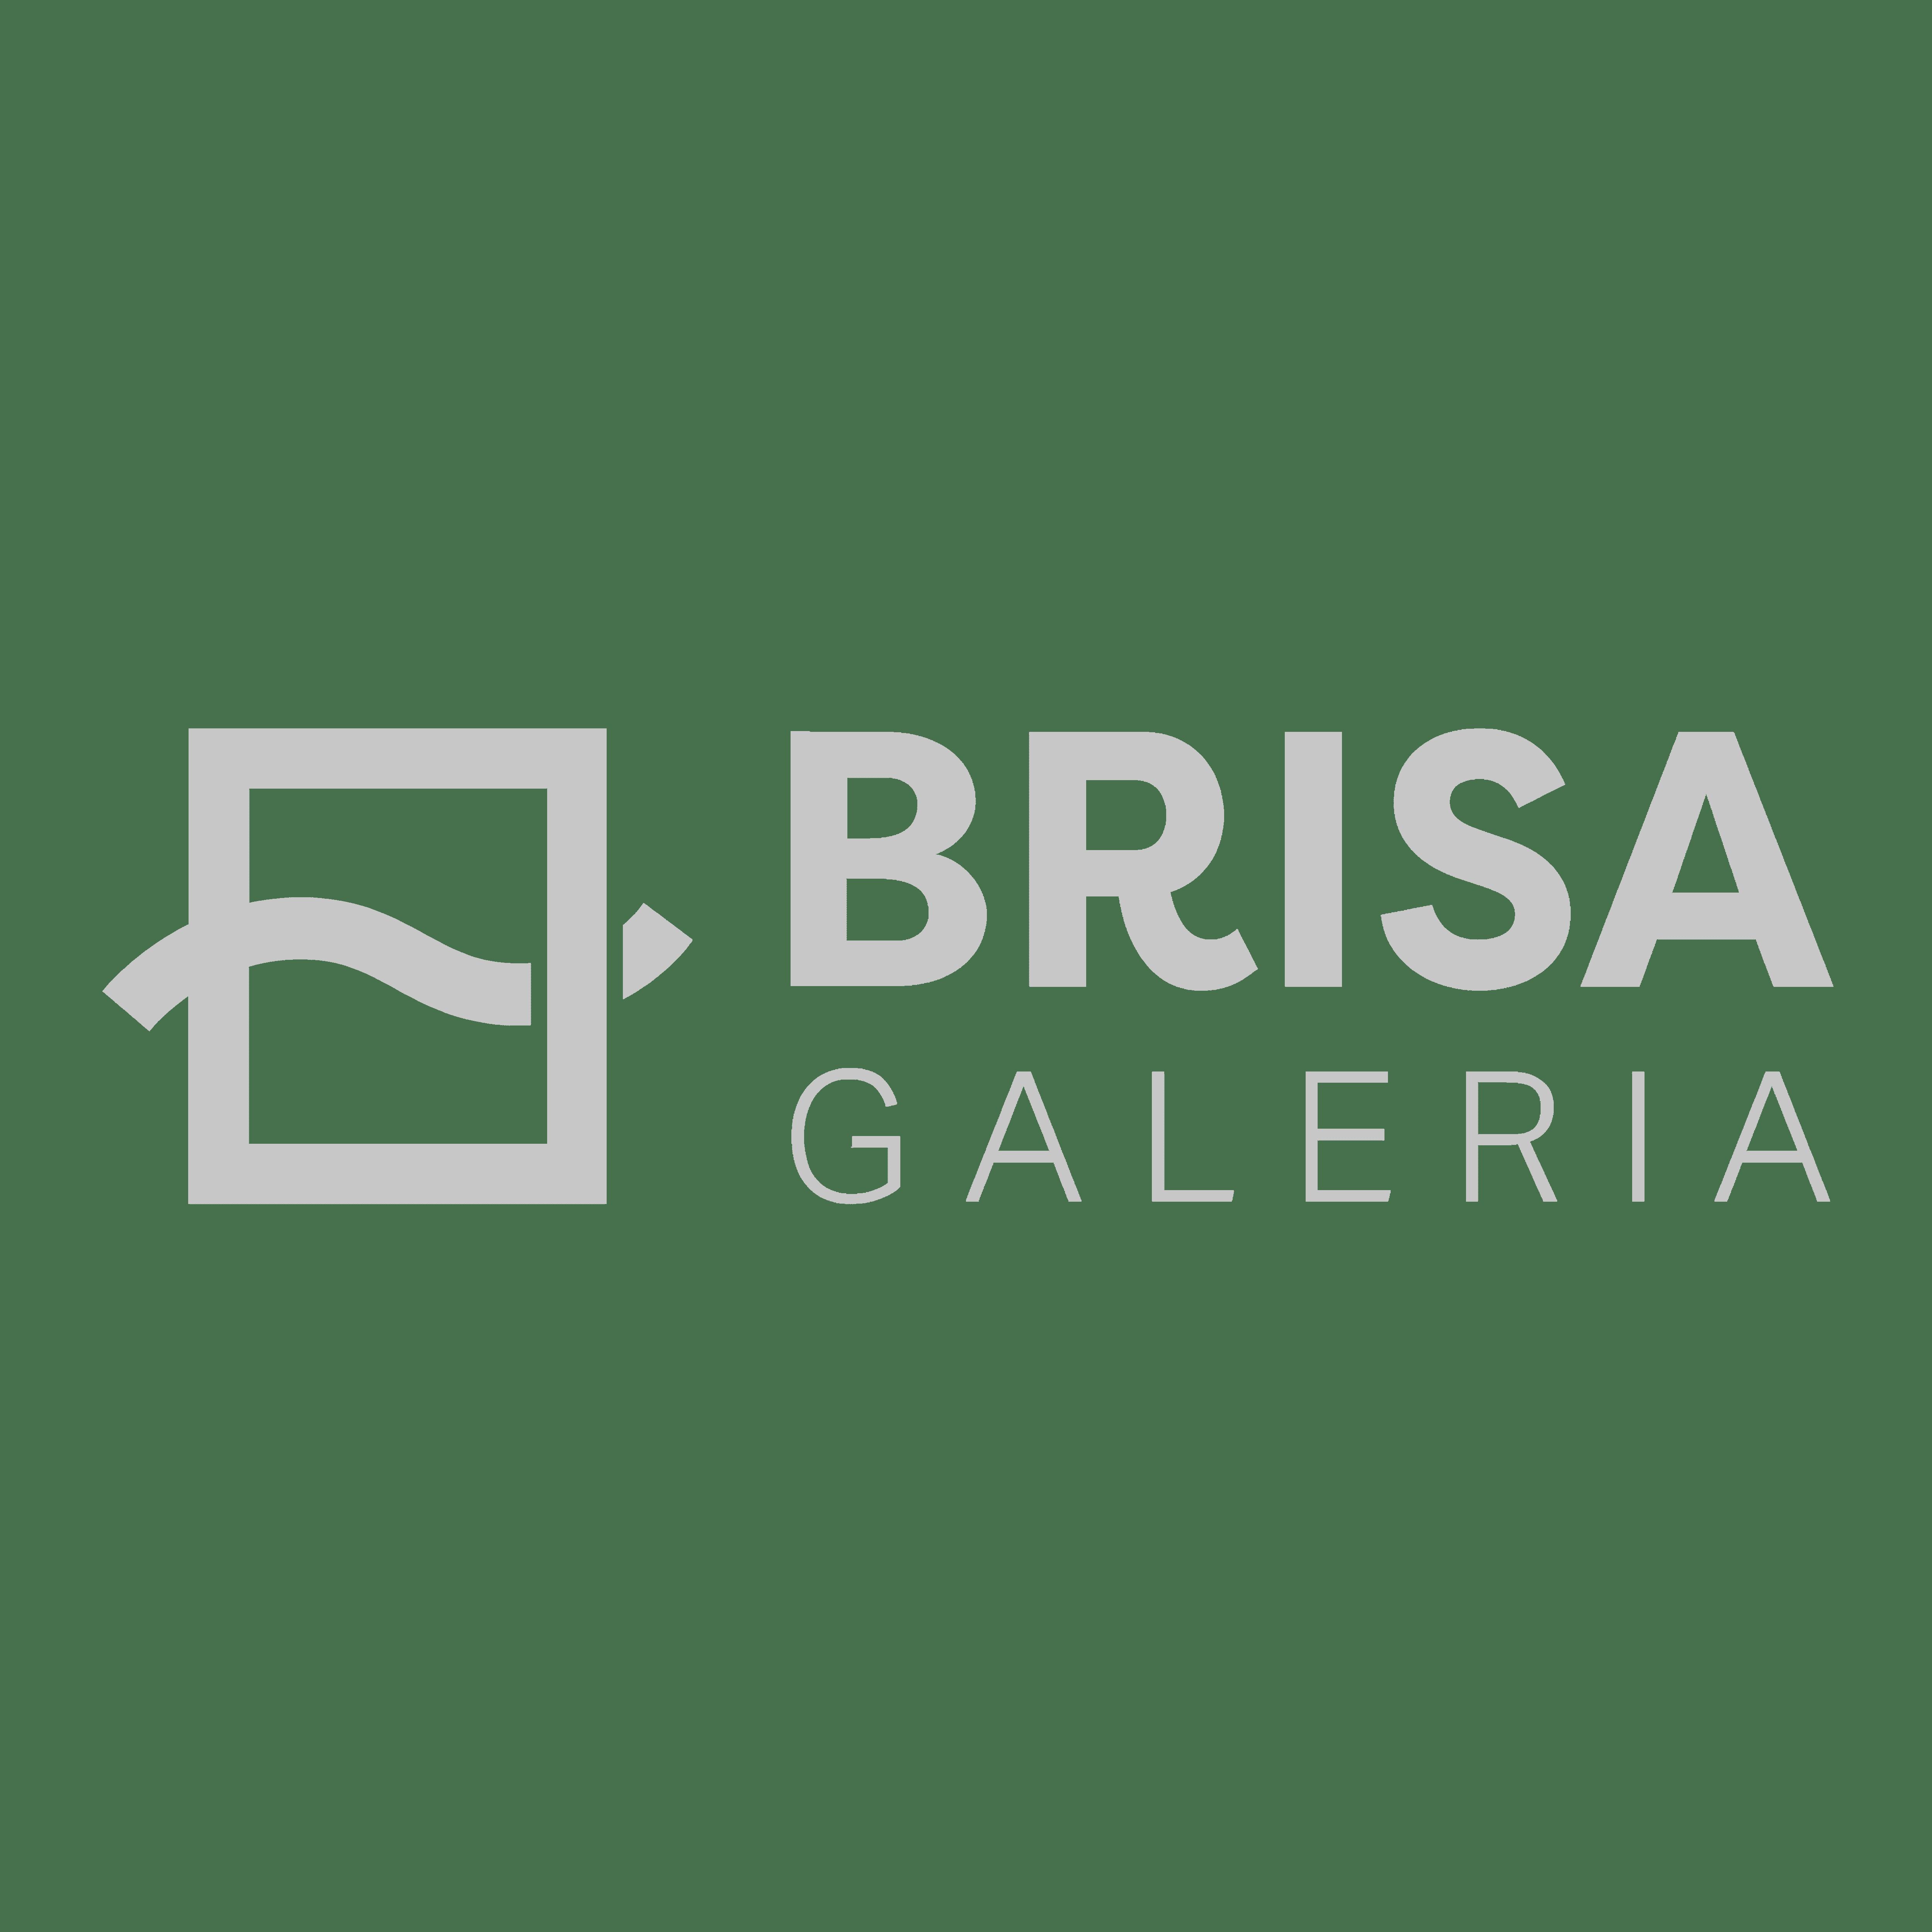 Brisa Galeria company logo